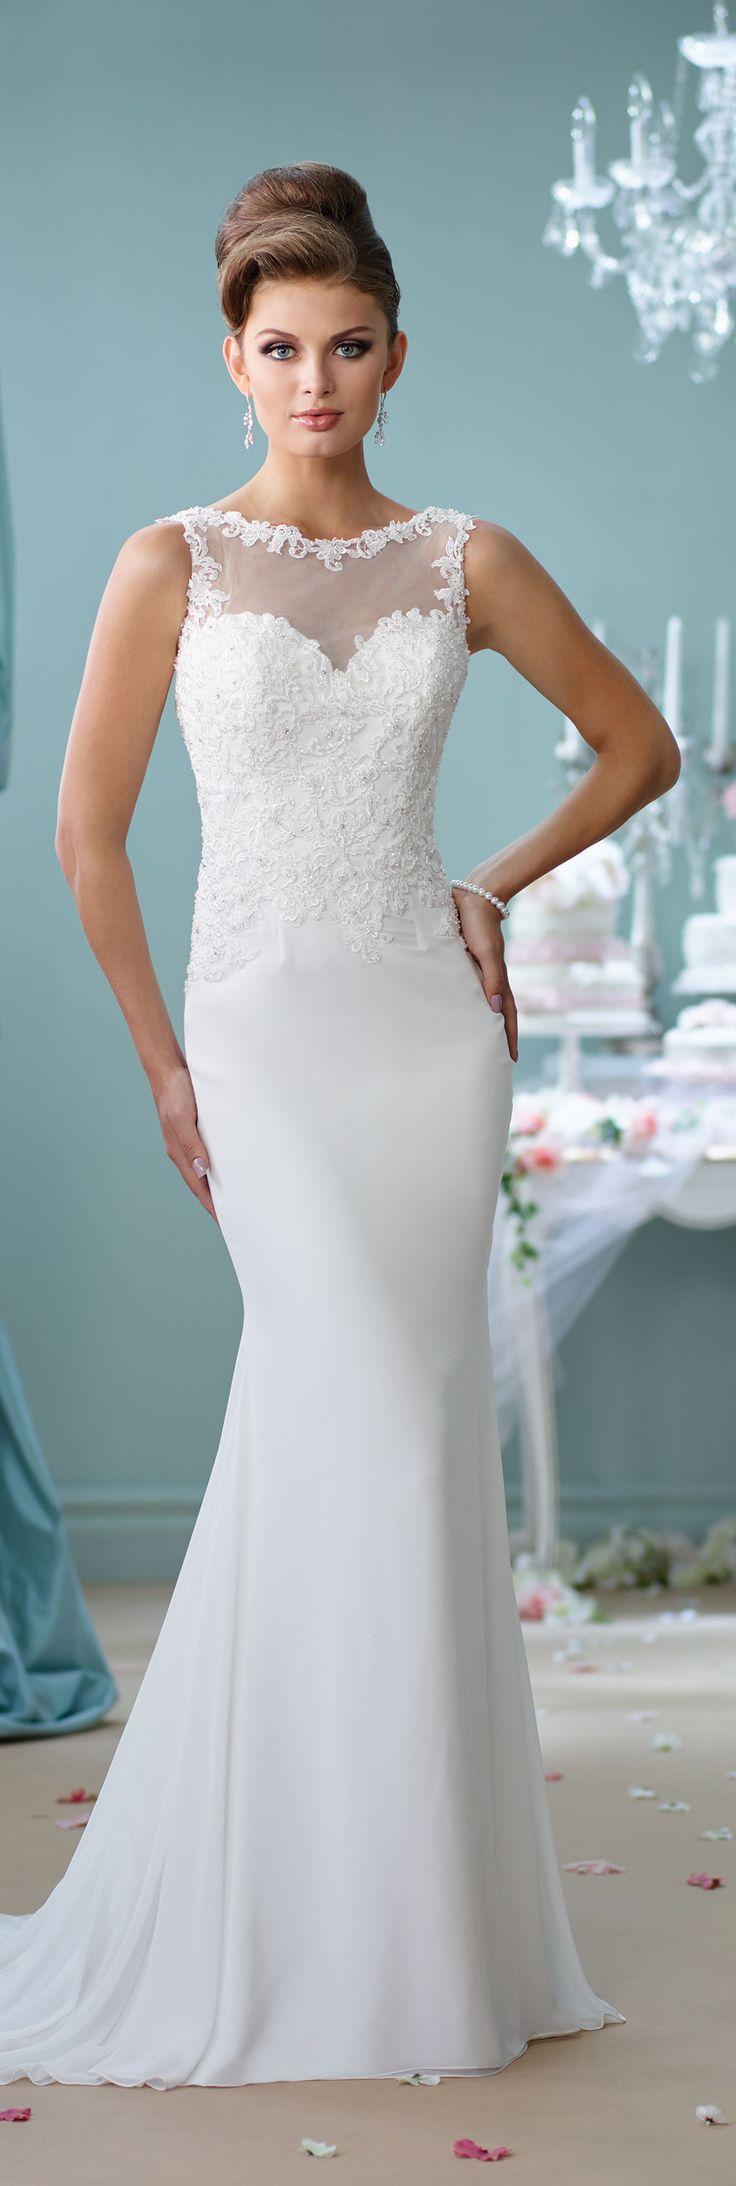 Wedding Dresses by Mon Cheri - Enchanting Spring 2016 ~Style No. 116143 #chiffonweddingdress